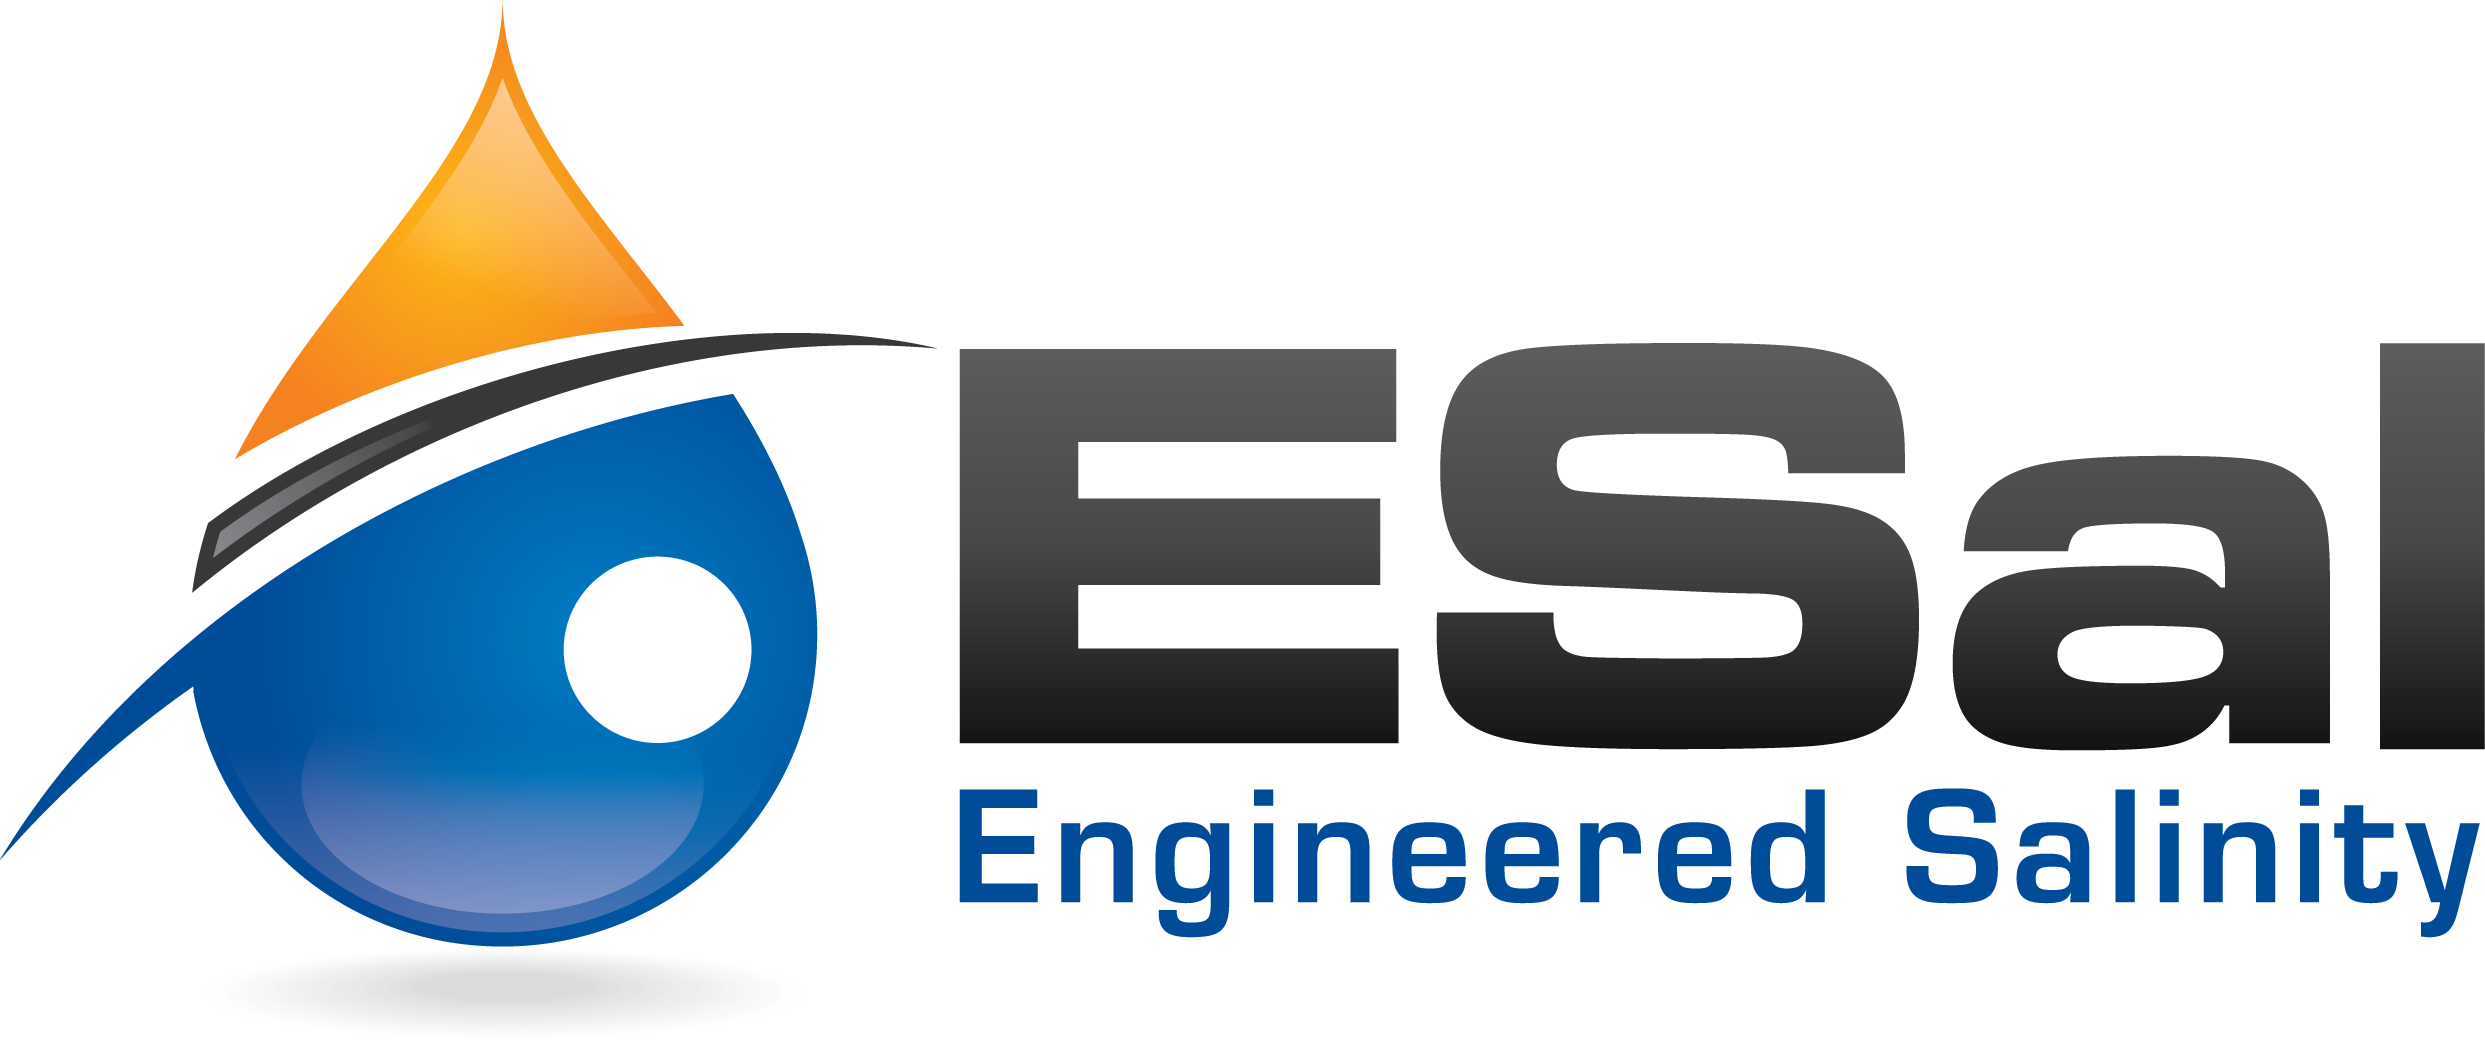 cropped esal logo